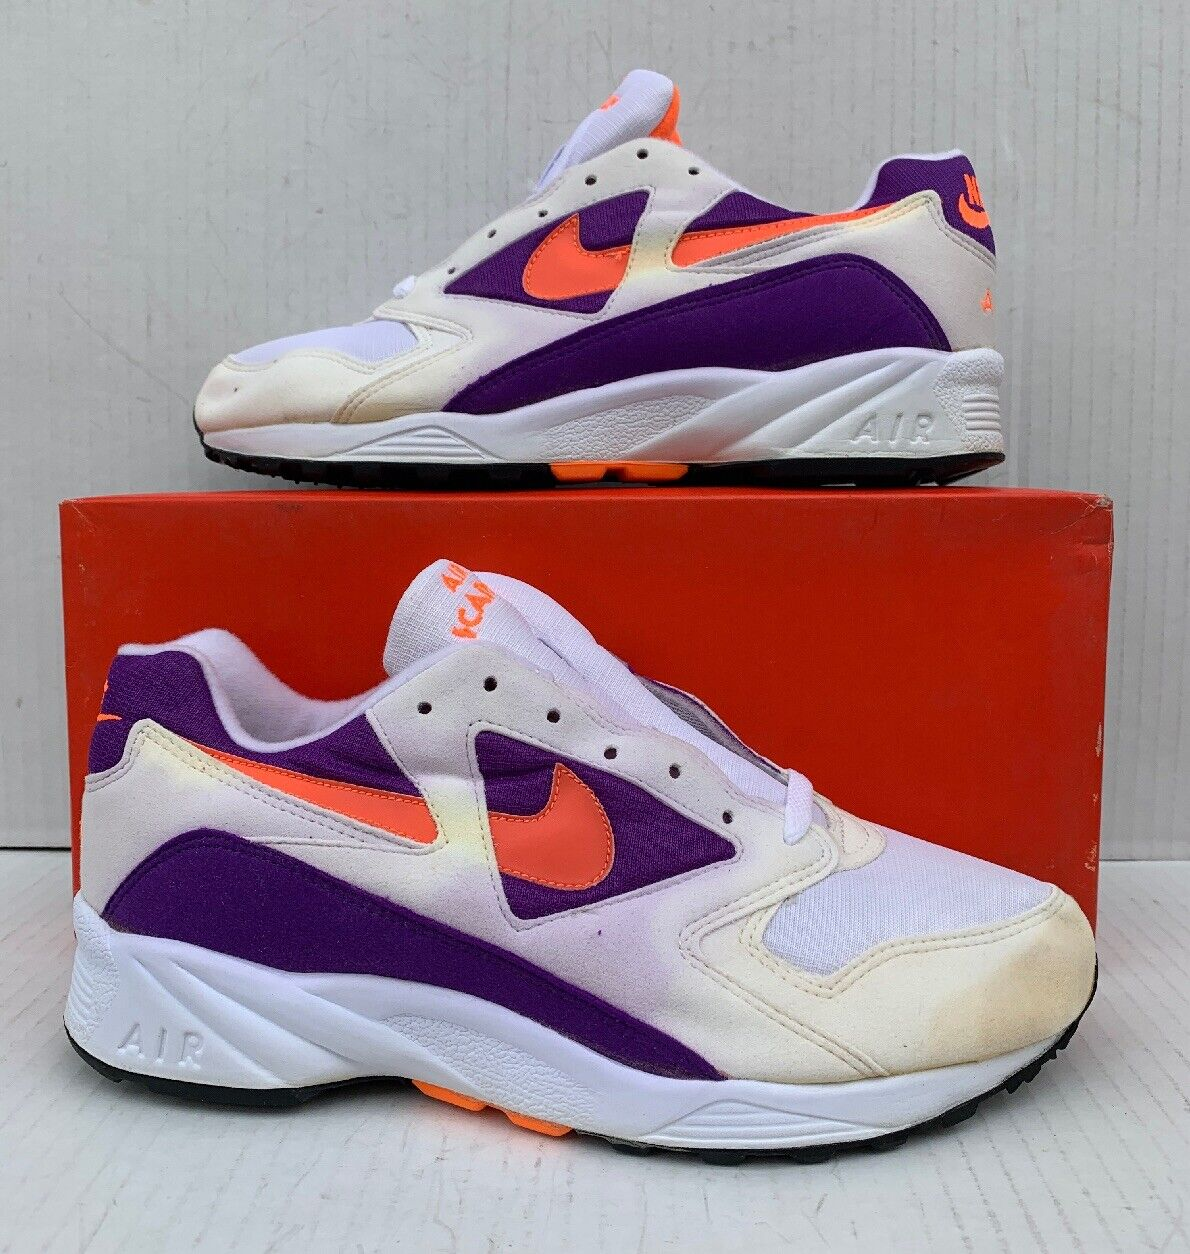 Vintage Nike Air Icarus Extra White Radiant orange Purple DS Size 9 104012-180